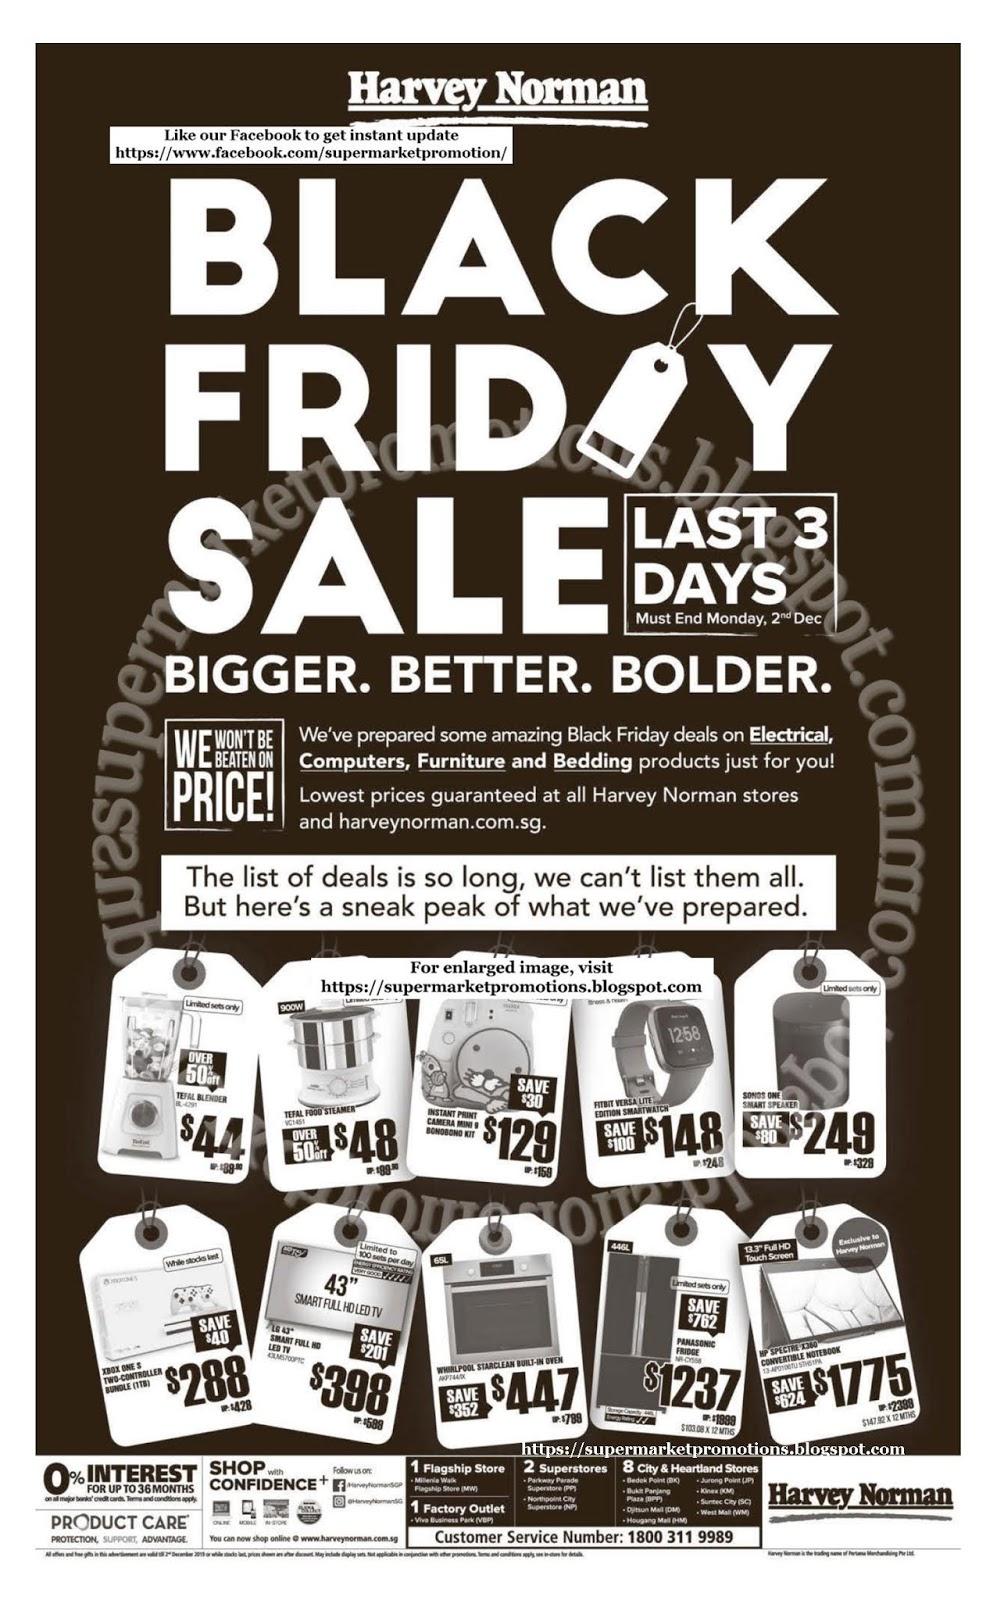 Harvey Norman Black Friday Sale 30 November - 02 December